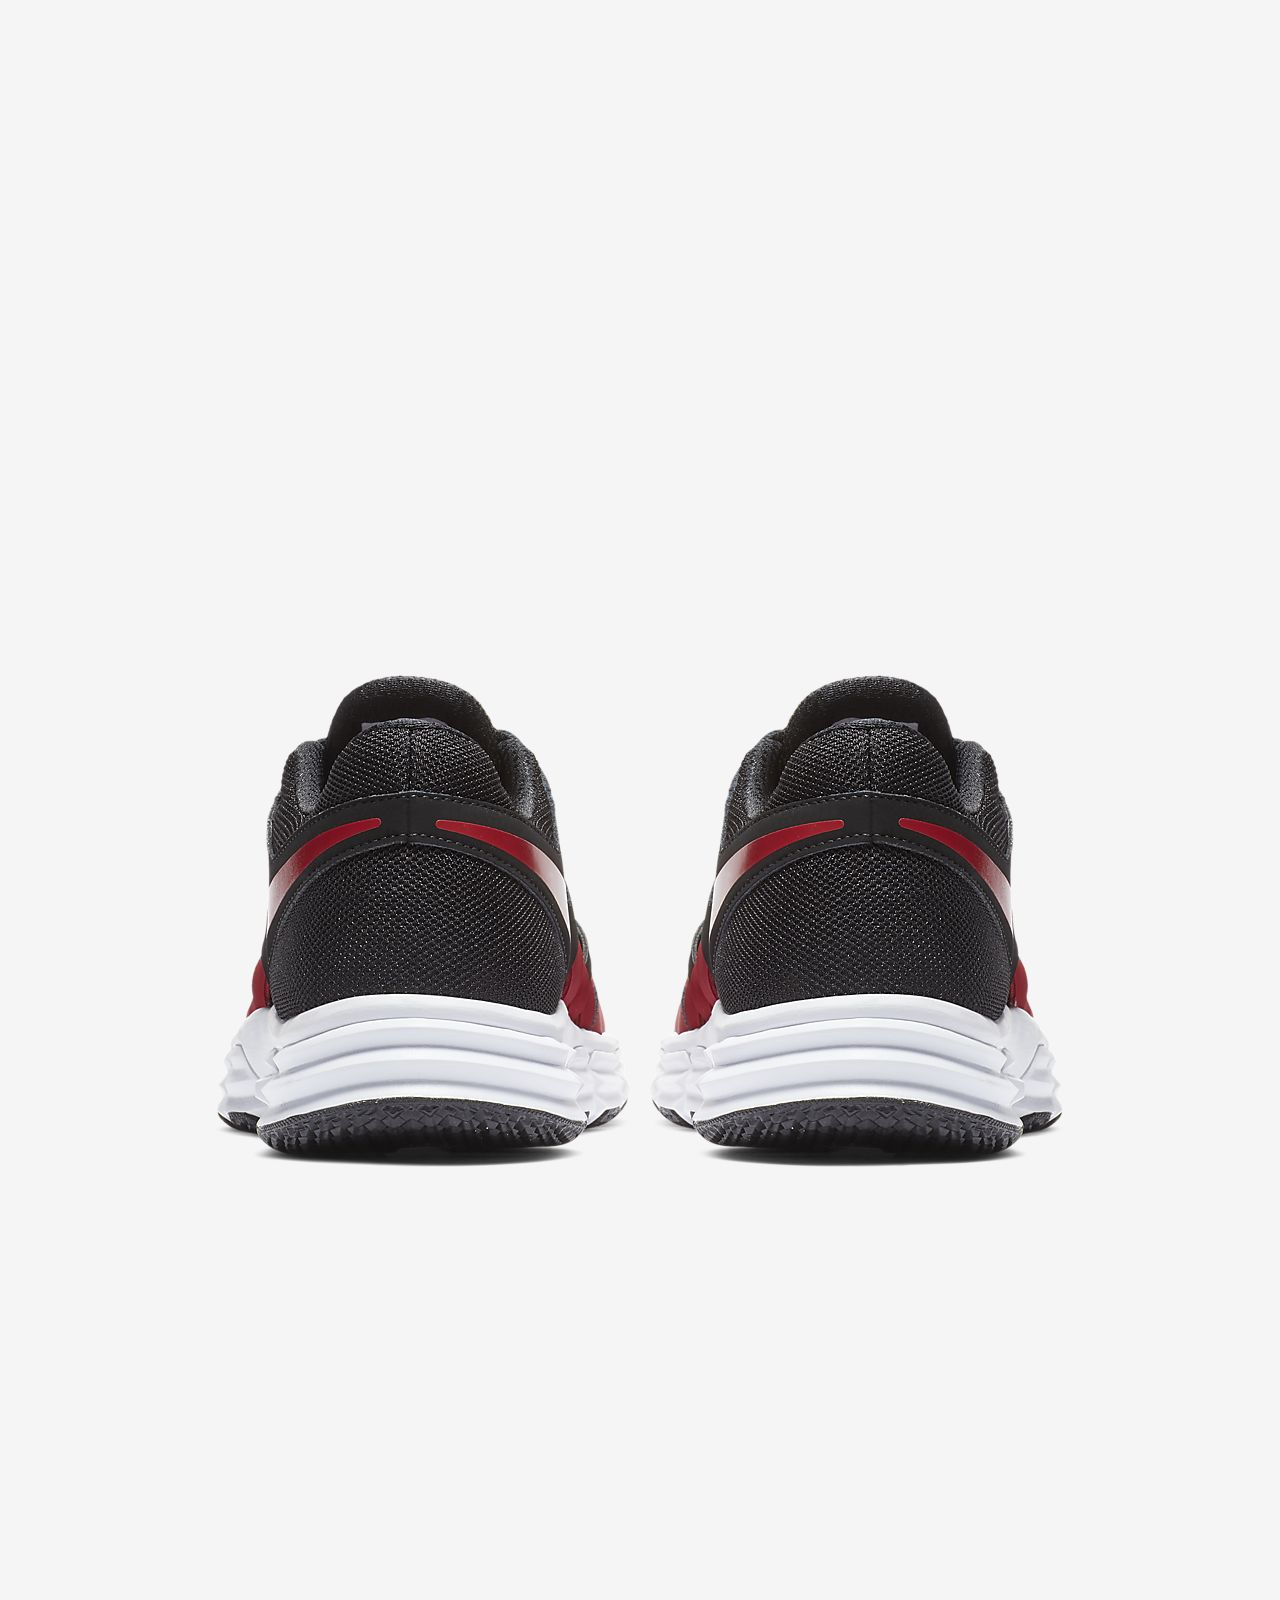 the latest dfc9d 851ca ... Nike Lunar Fingertrap TR Men s Gym Gameday Shoe